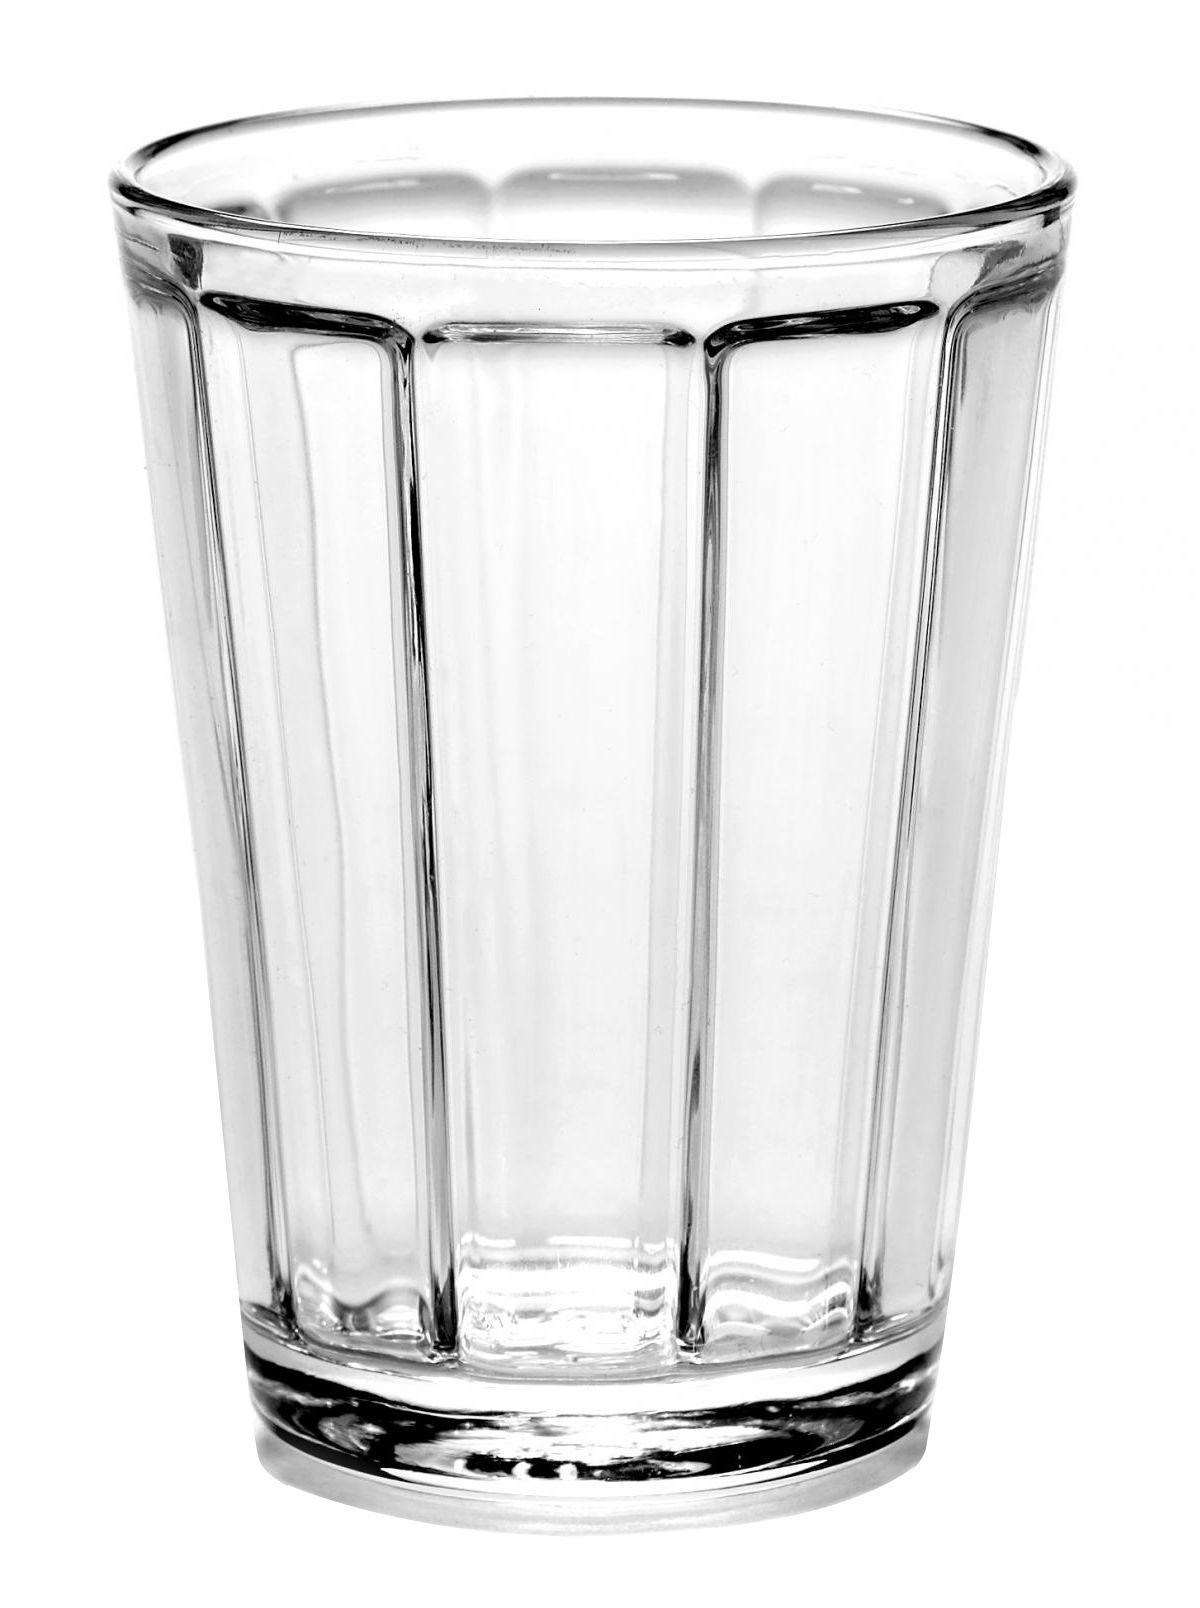 Verre eau surface by segio herman transparent serax - Verres a eau design ...